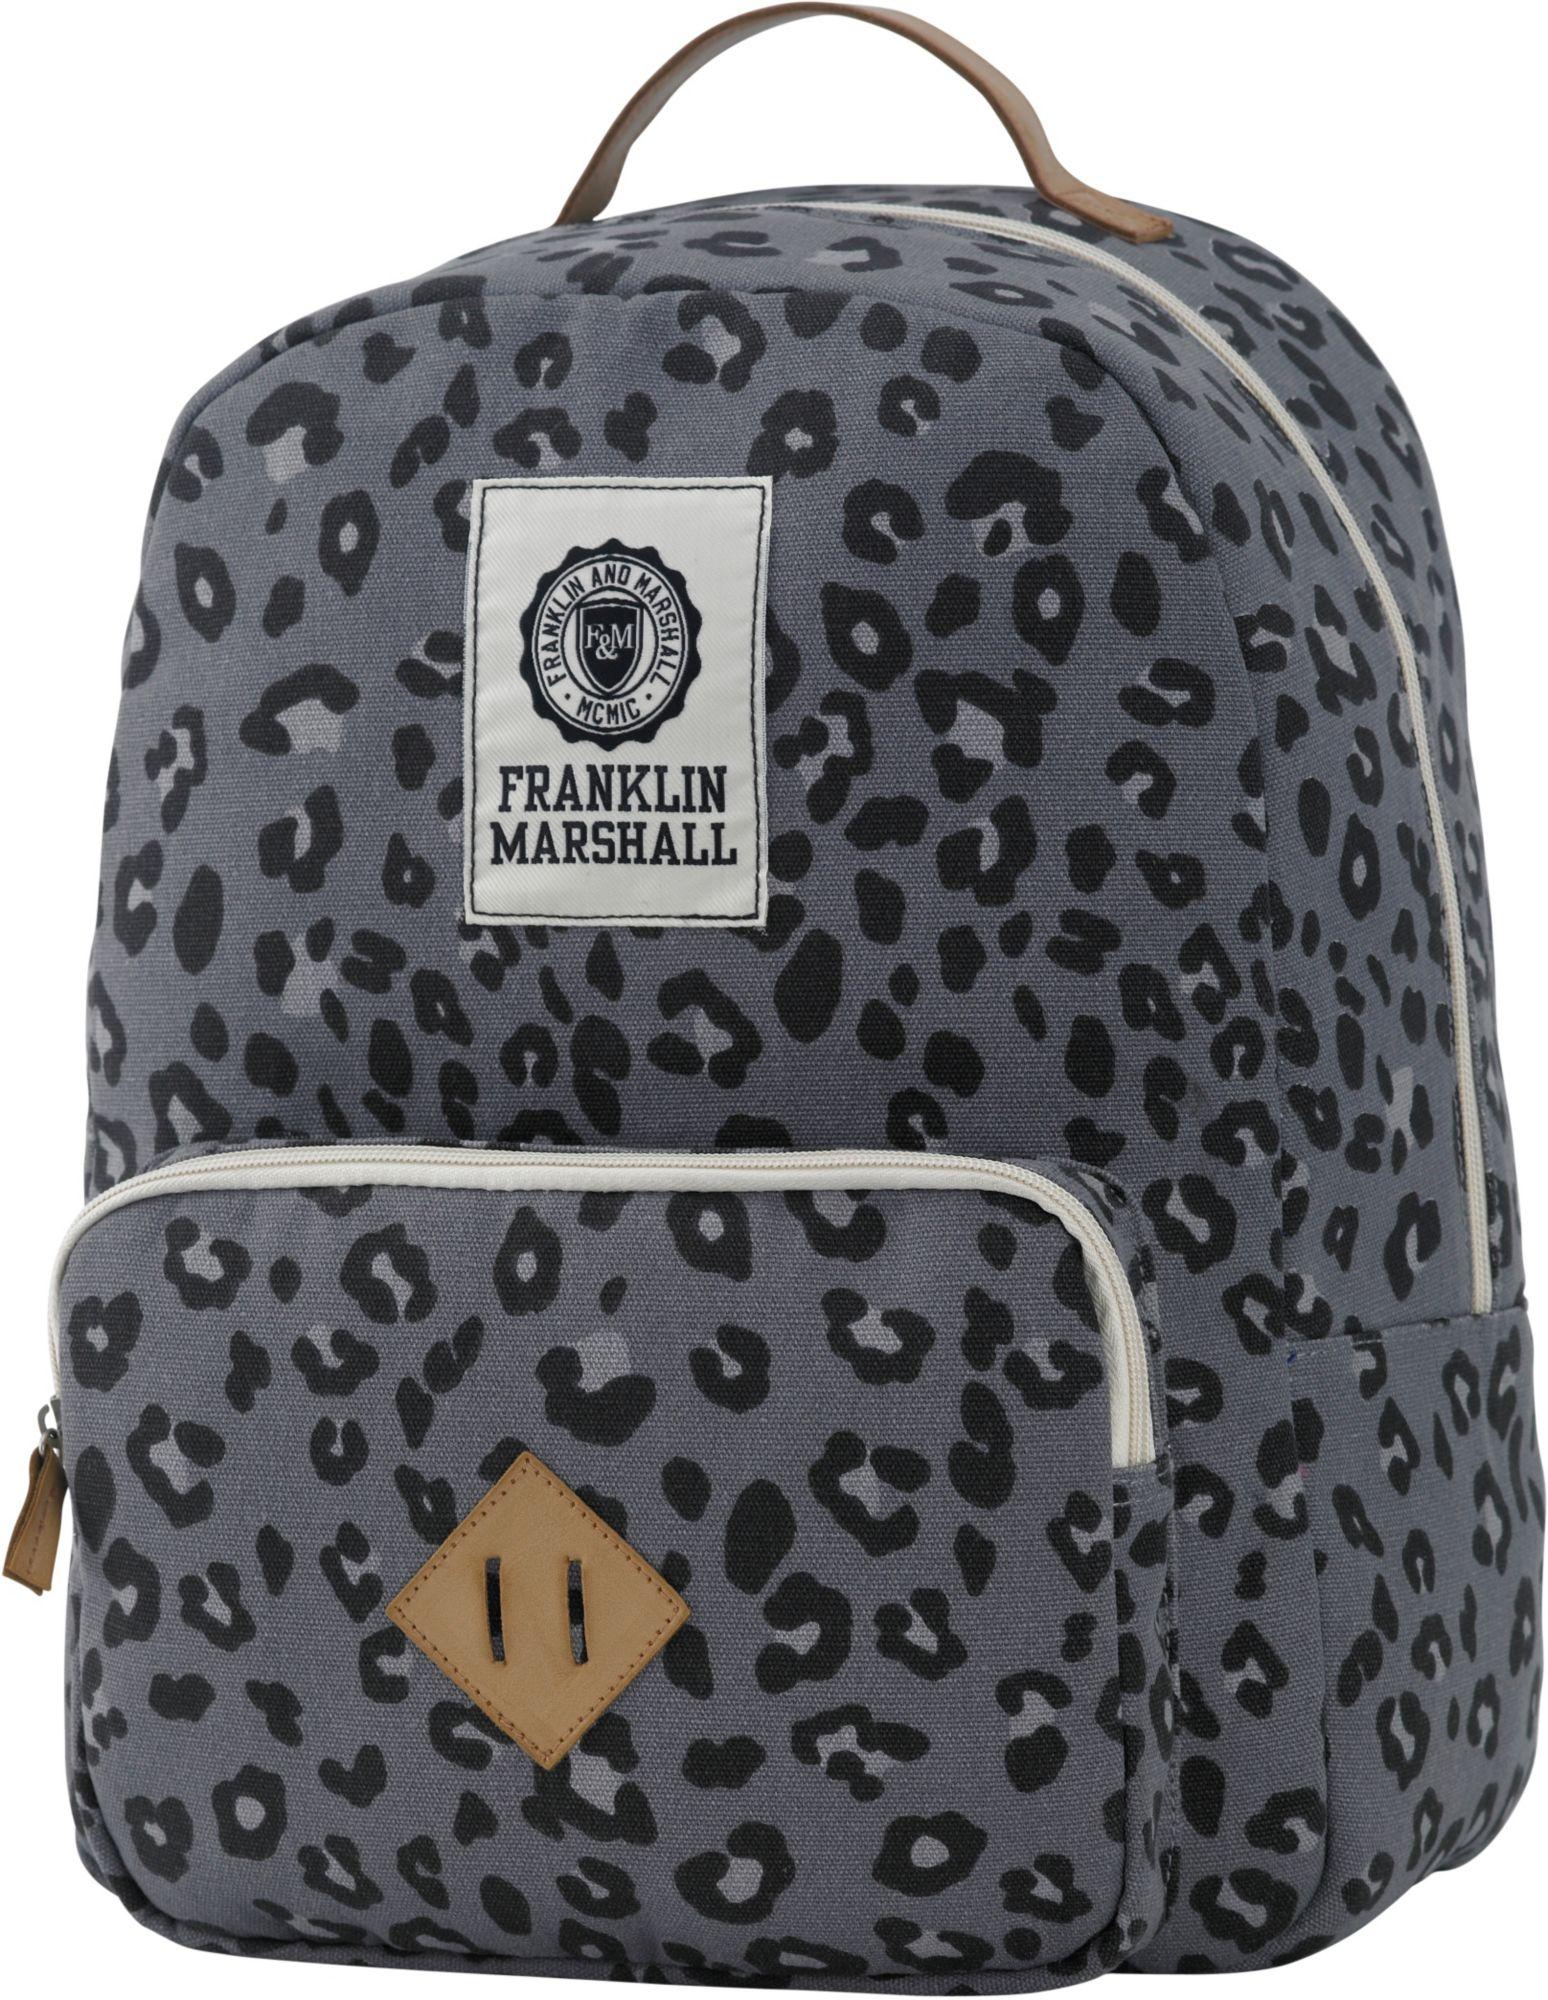 FRANKLIN MARSHALL Franklin & Marshall, Rucksack mit gepolstertem Laptopfach, »Girls Backpack, leopard«